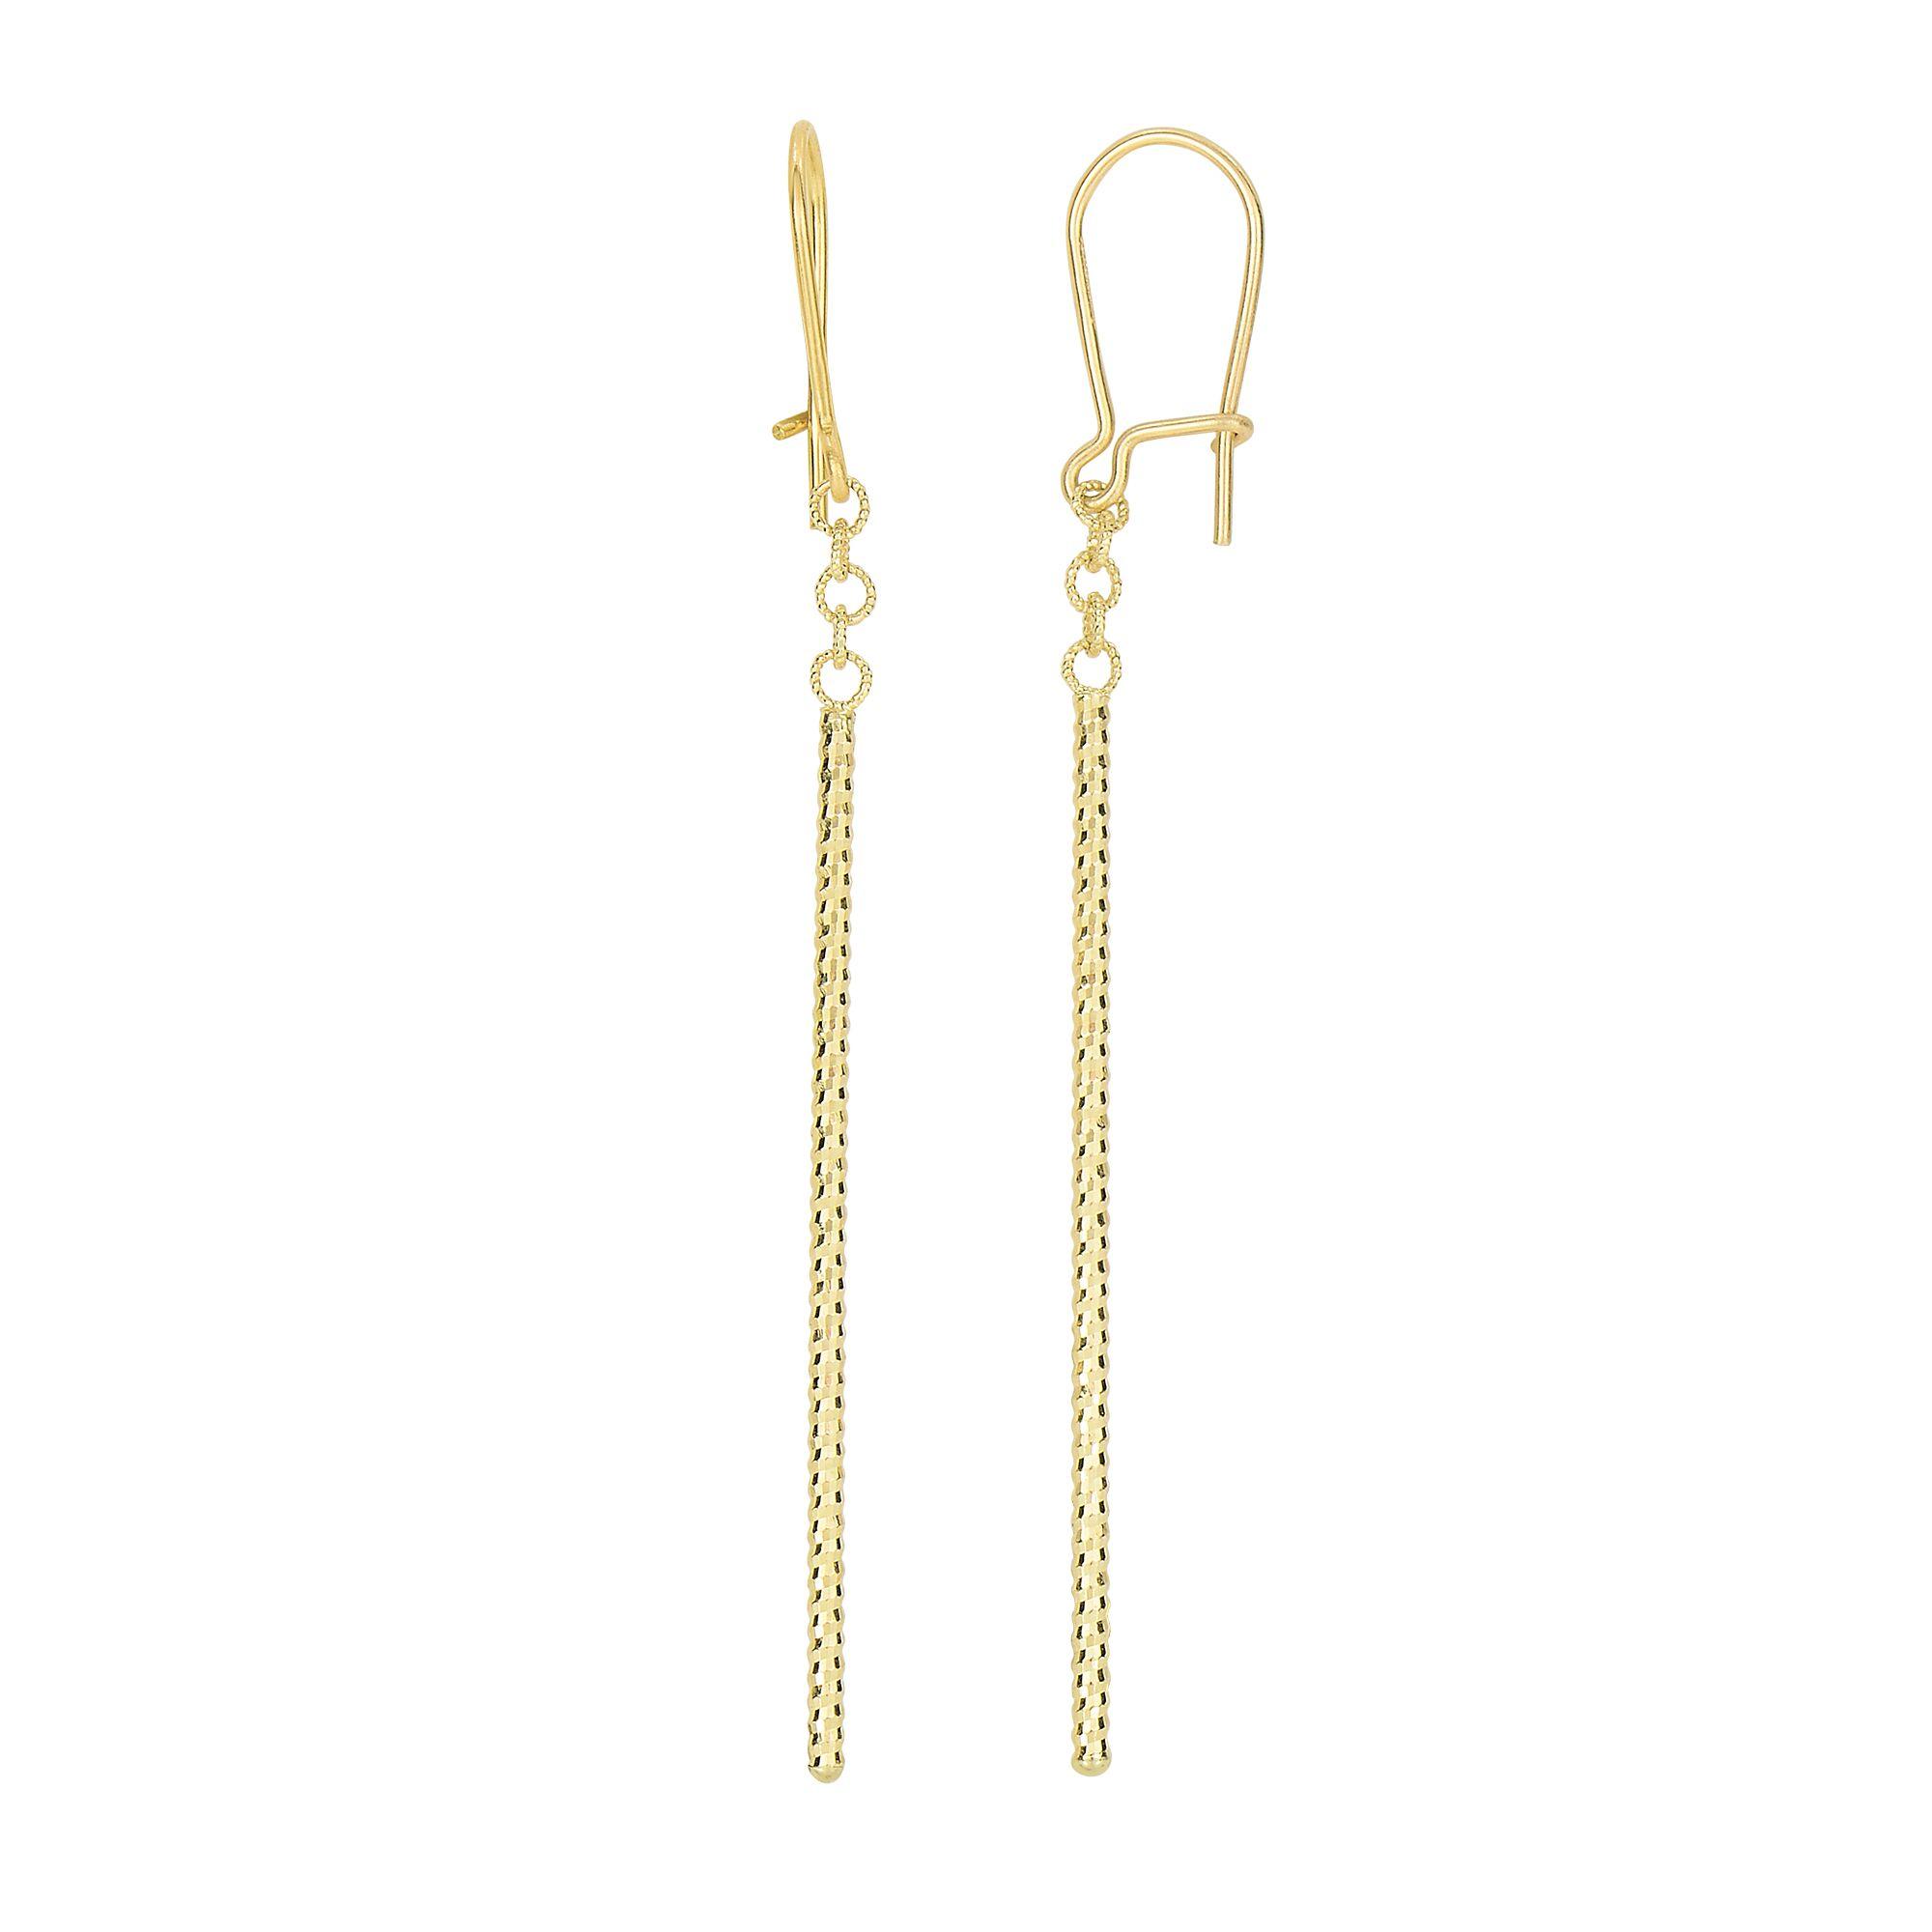 14 Karat Yellow Gold Diamond Cut Vertical Bar Dangling Earrings